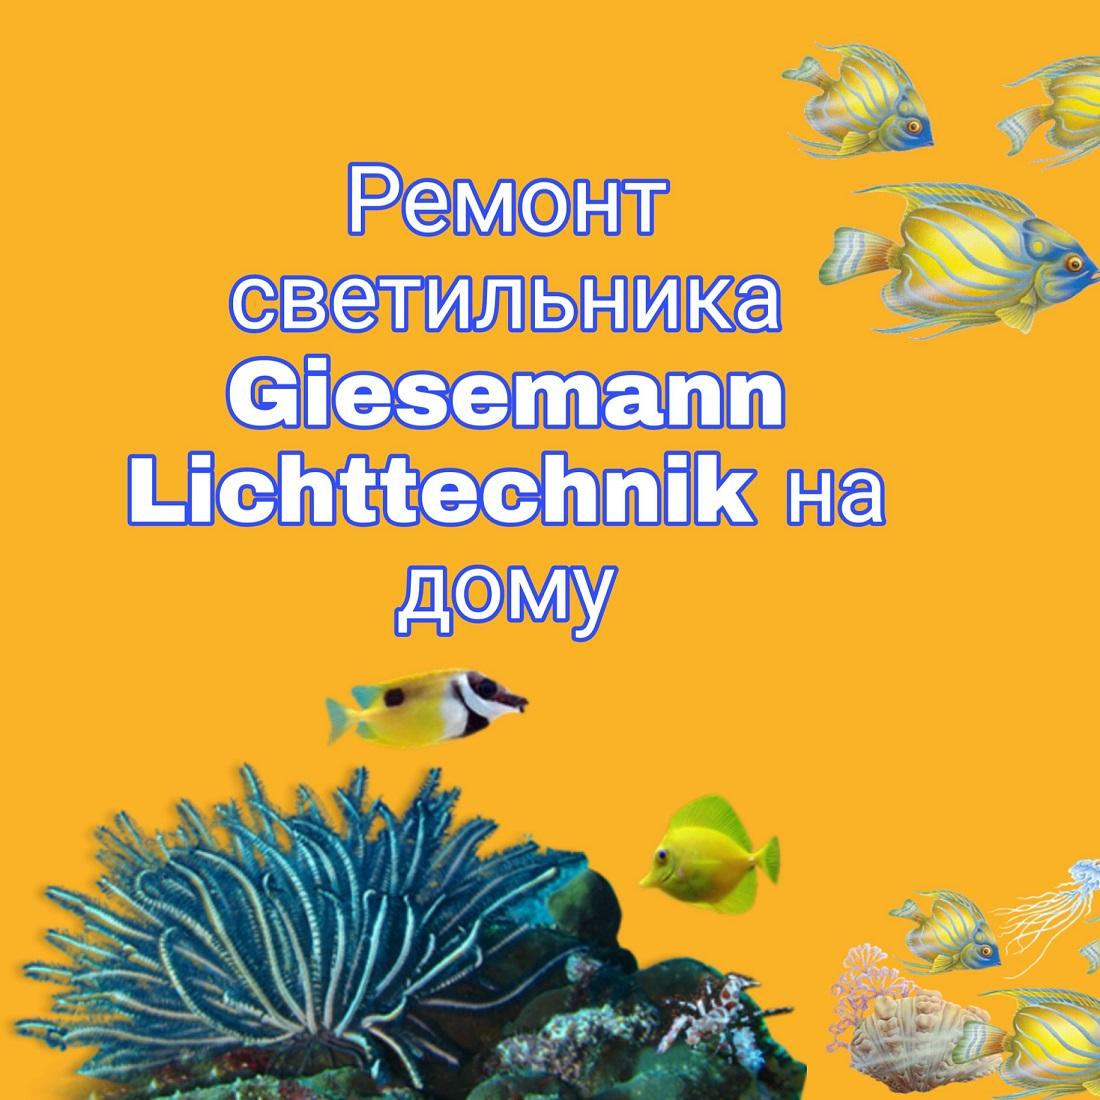 Ремонт аквариумного светильника Giesemann Lichttechnik на дому